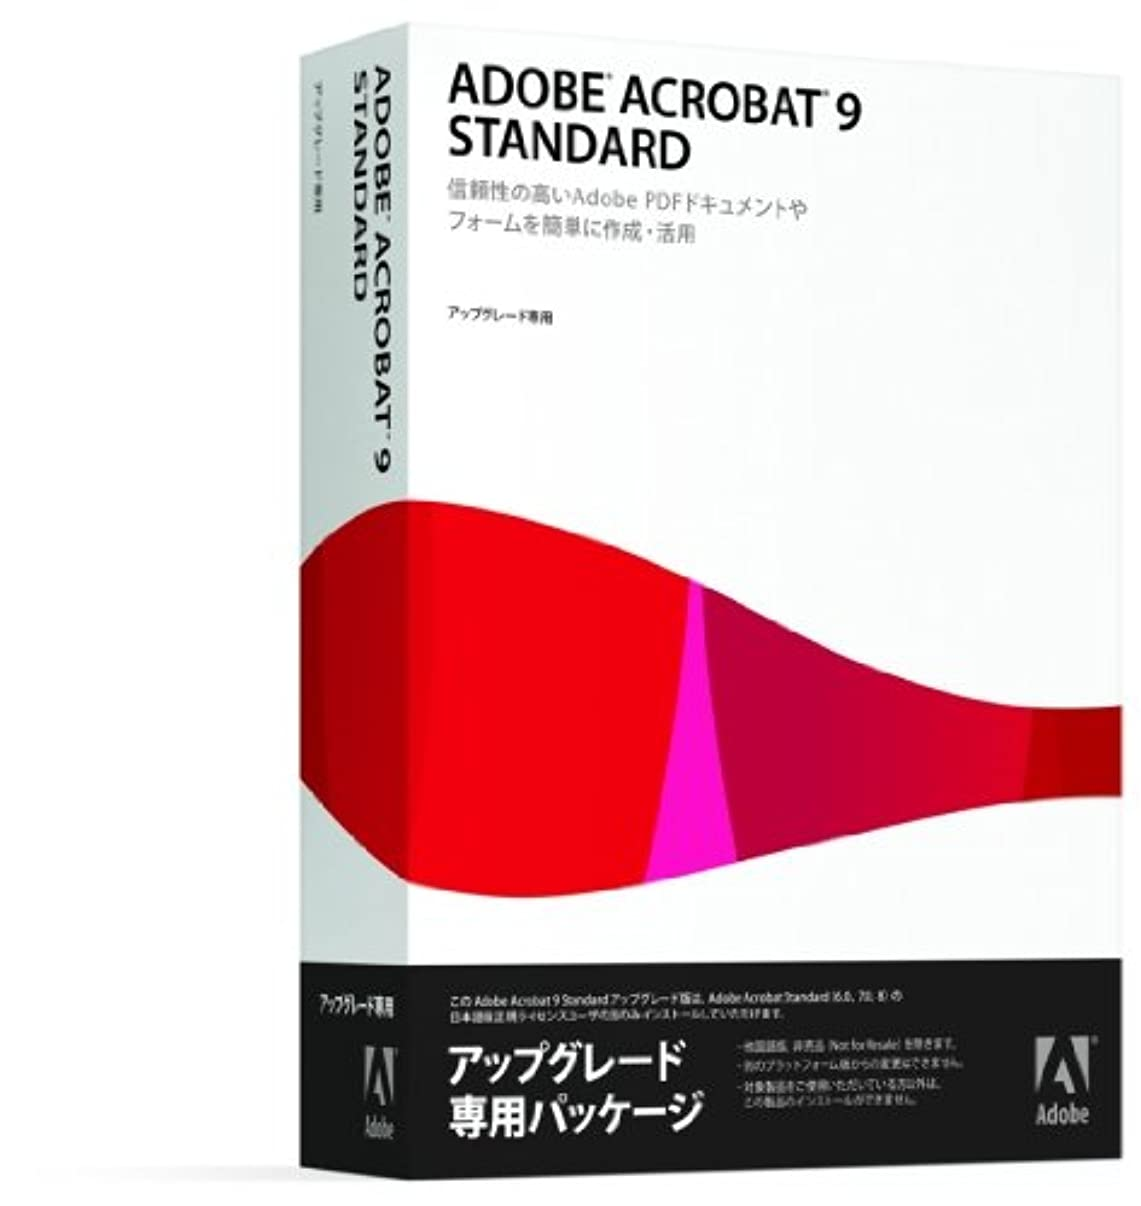 事実入植者真剣にAdobe Acrobat 9 Standard 日本語版 アップグレード版 (STD-STD) Windows版